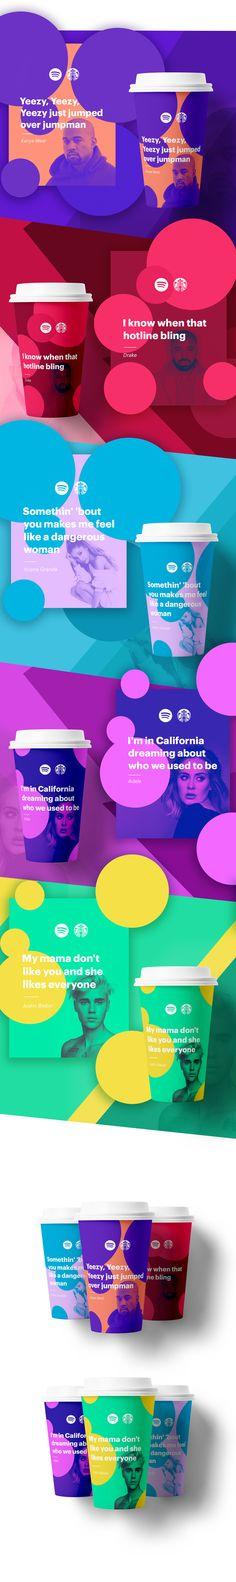 Starbucks X Spotify on Behance